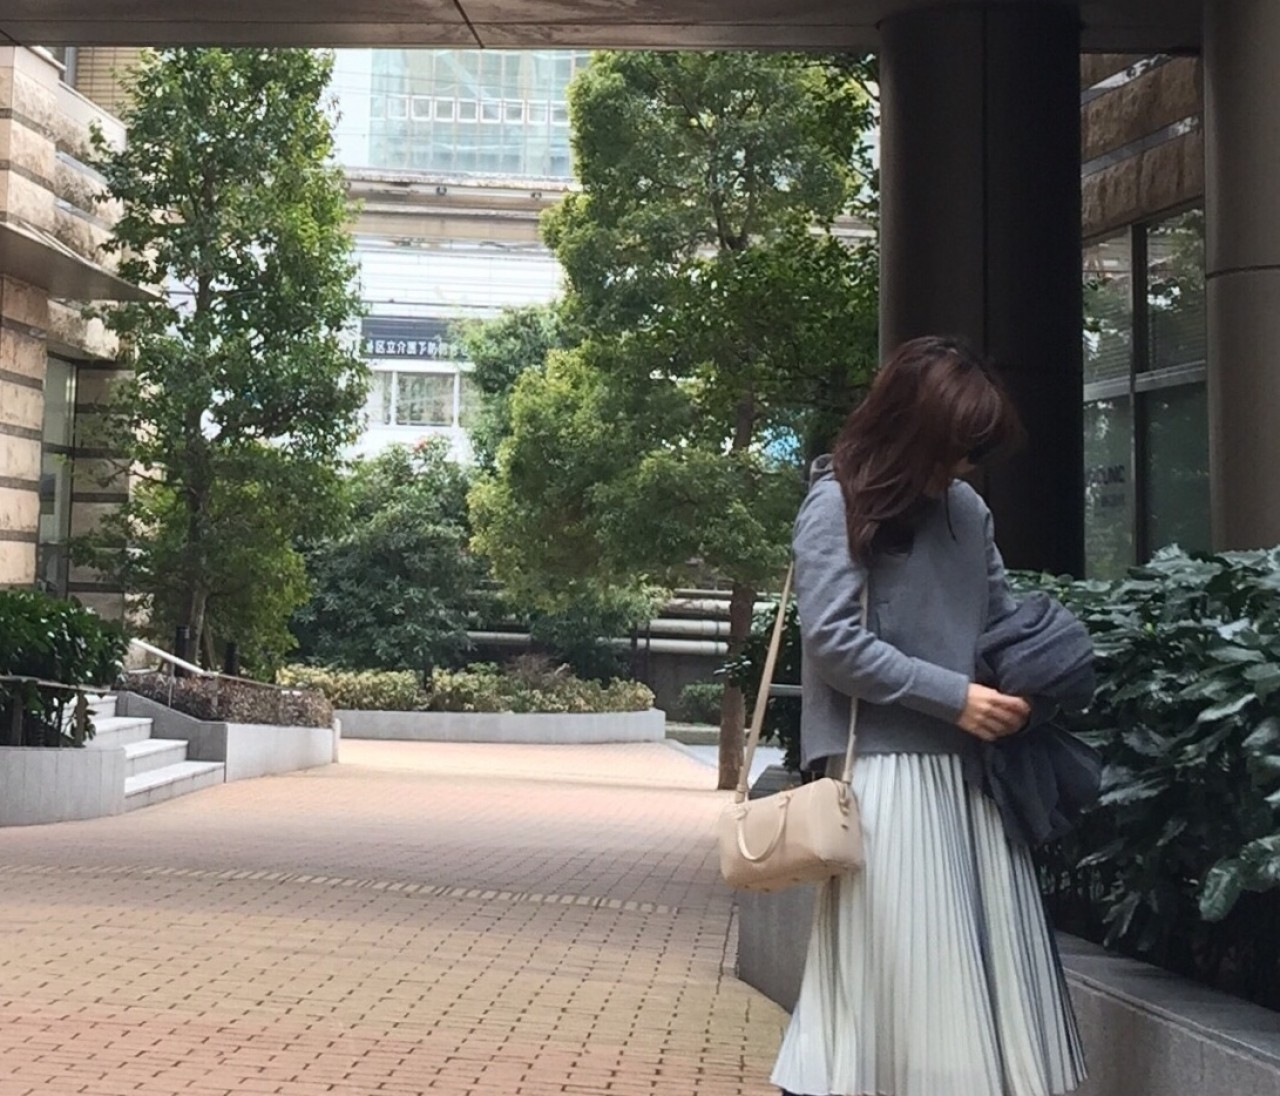 【#OOTD】新人K嬢は、美シルエットなプリーツスカートで気分上々♪